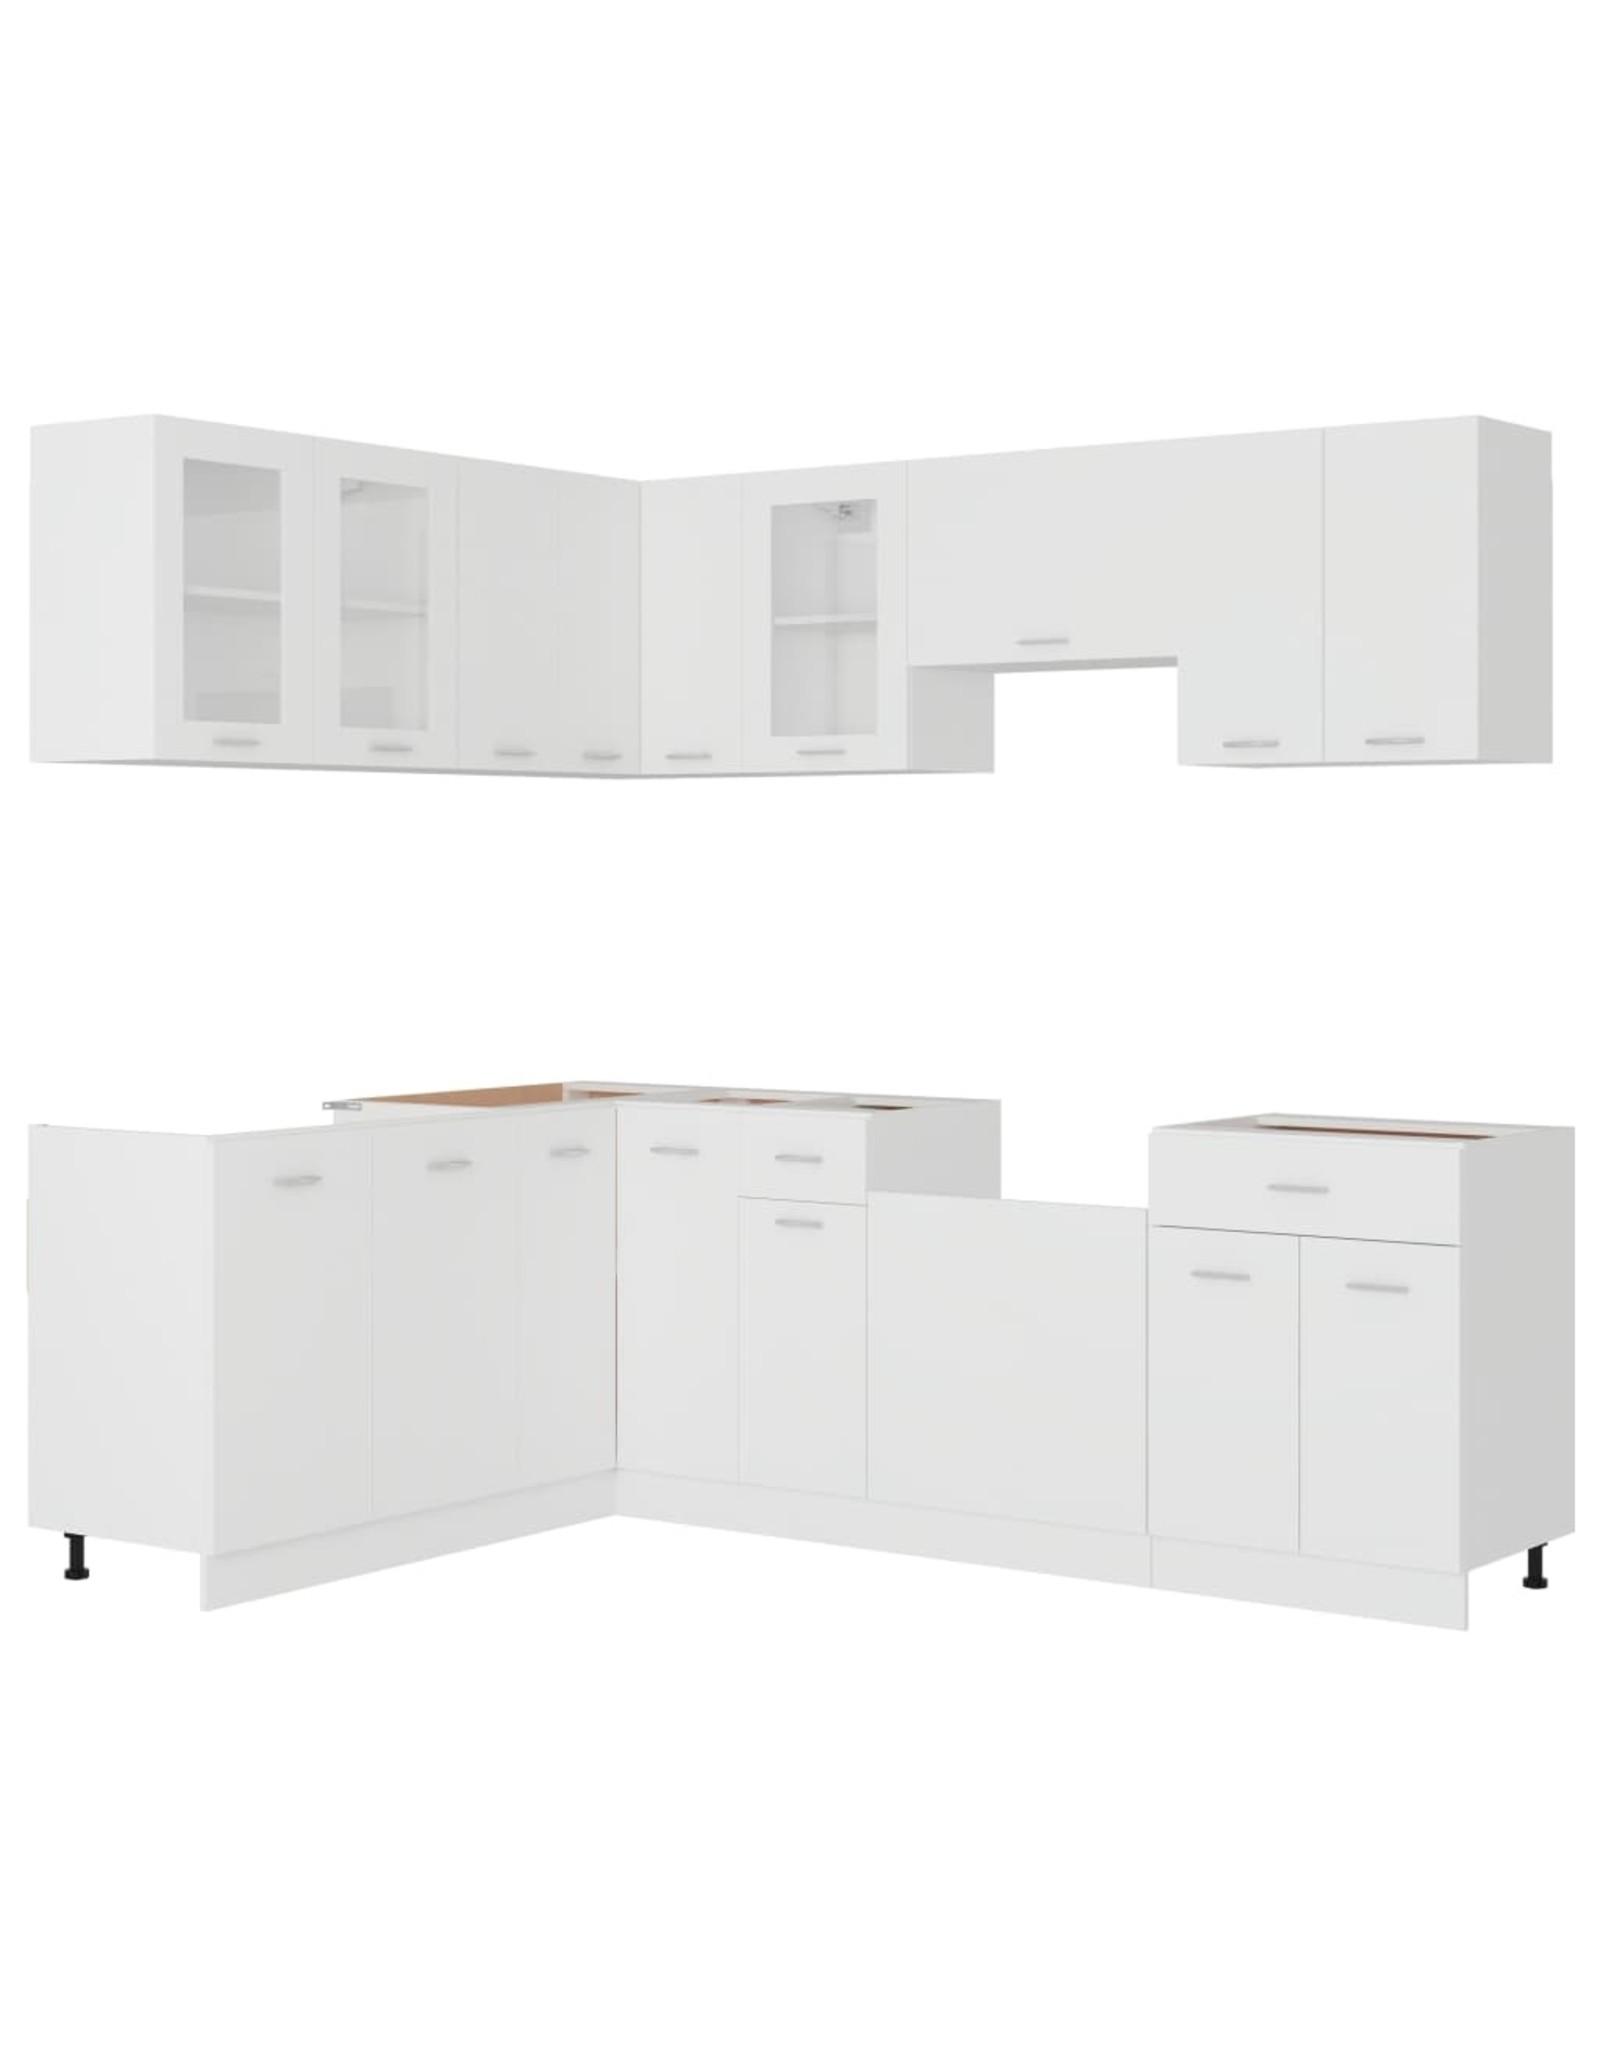 11-delige Keukenkastenset spaanplaat wit